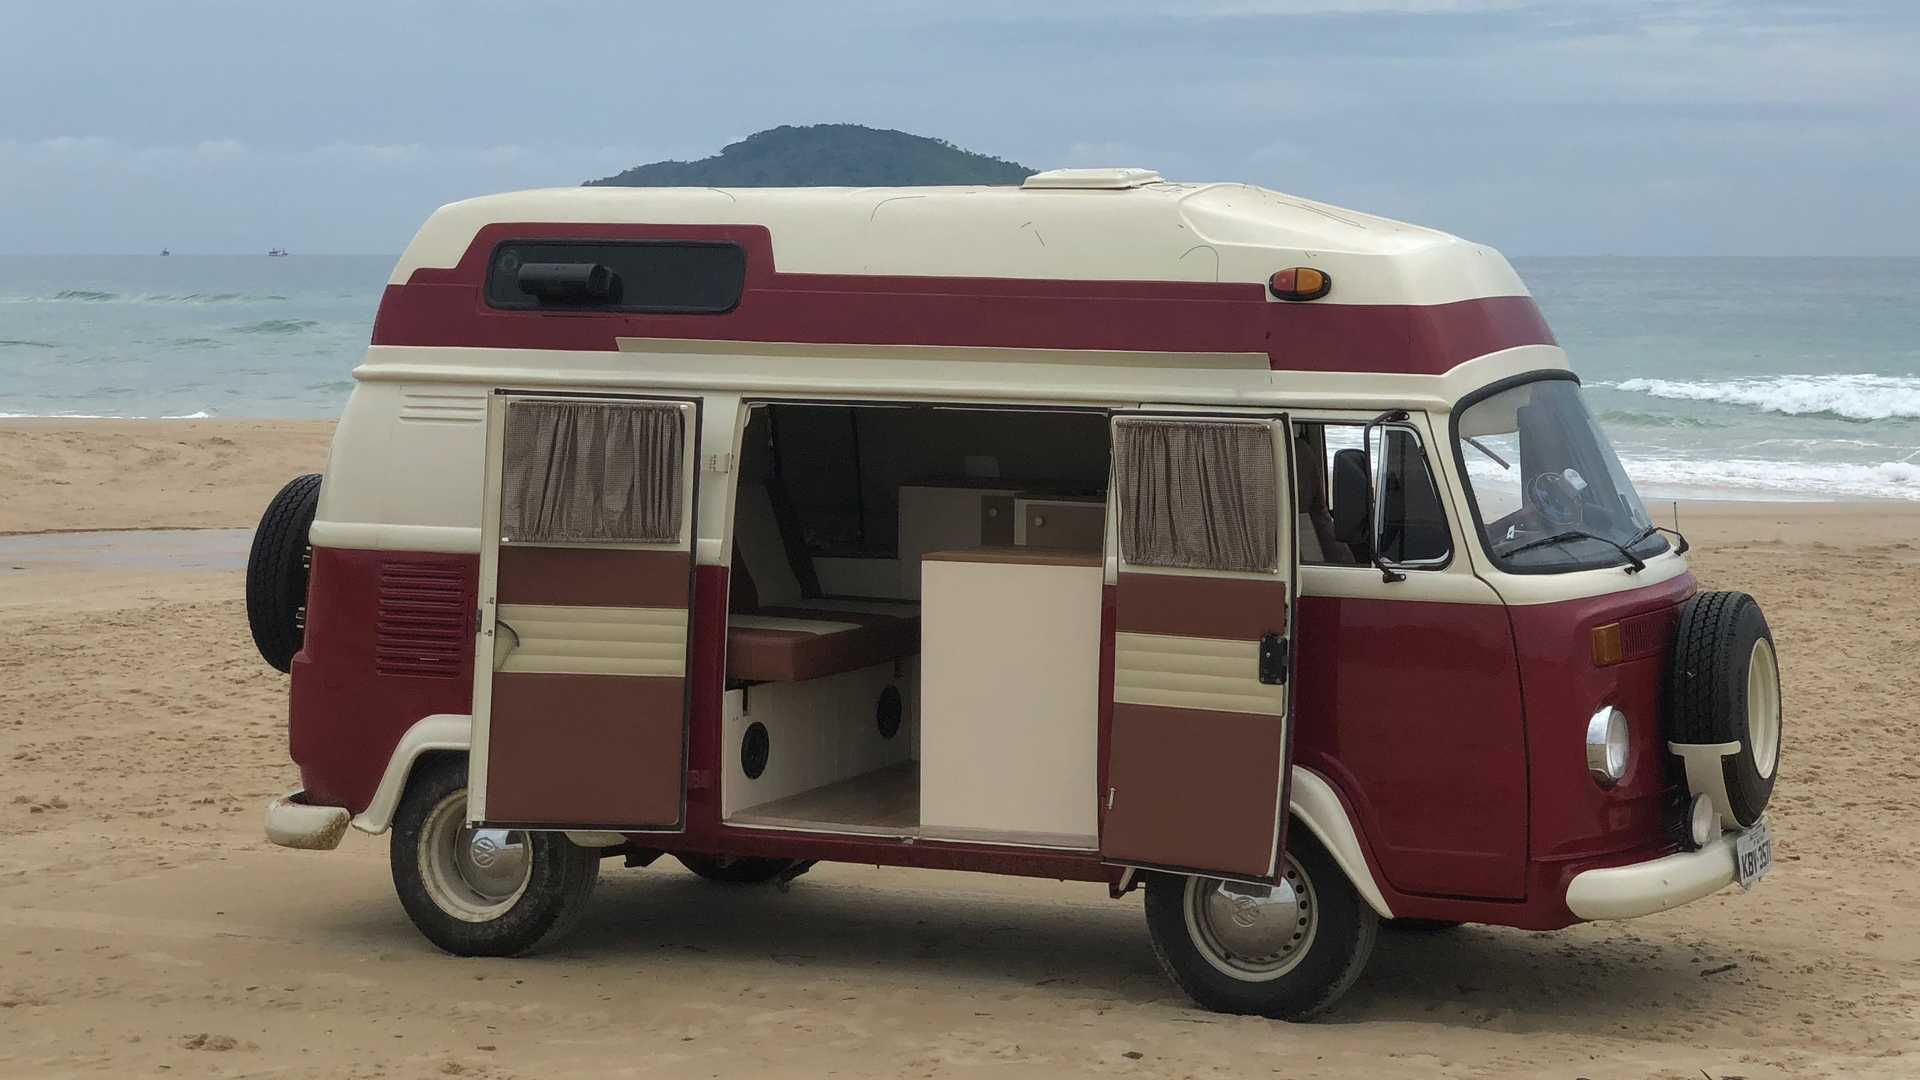 10 Best Volkswagen Camper Vans For The Ultimate Road Trip